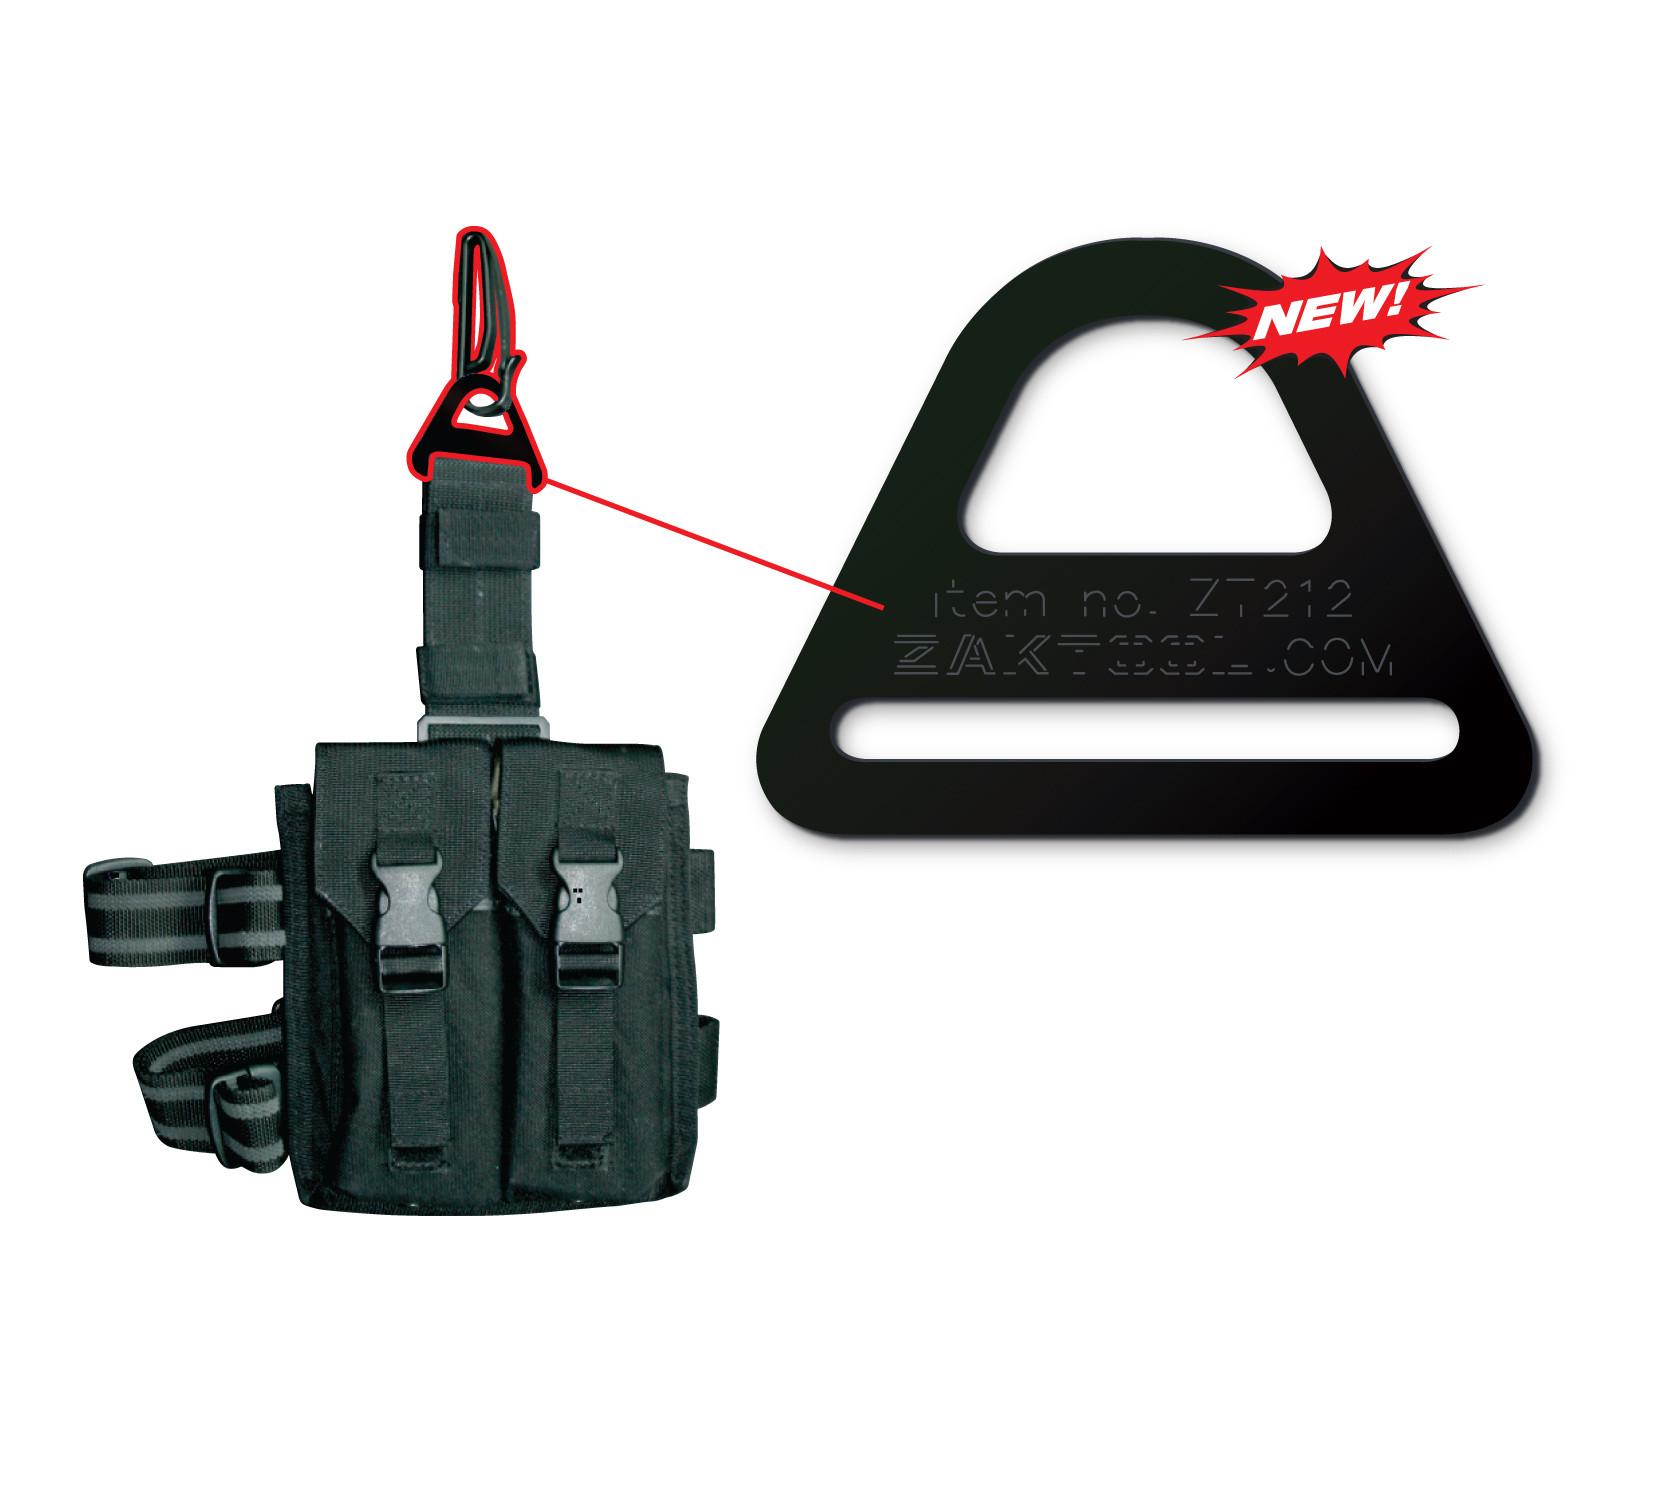 ZAK Buckle with ZT55 Key Ring Holder Combo Pack -ZAK Tool